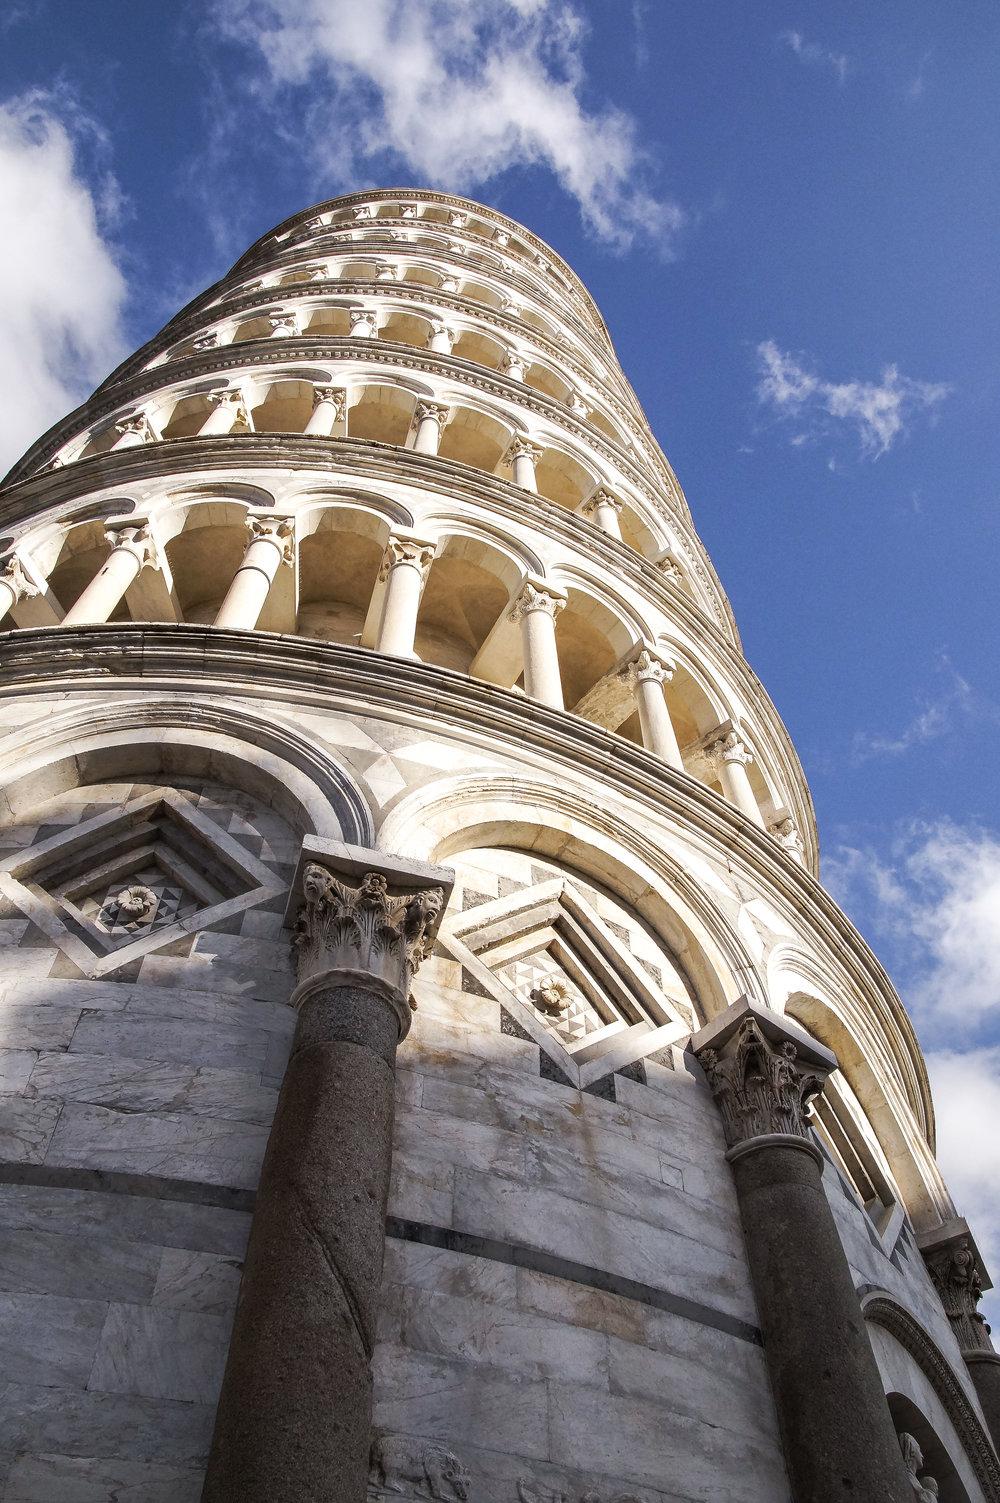 Leaning Tower of Pisa - Pisa, Italy